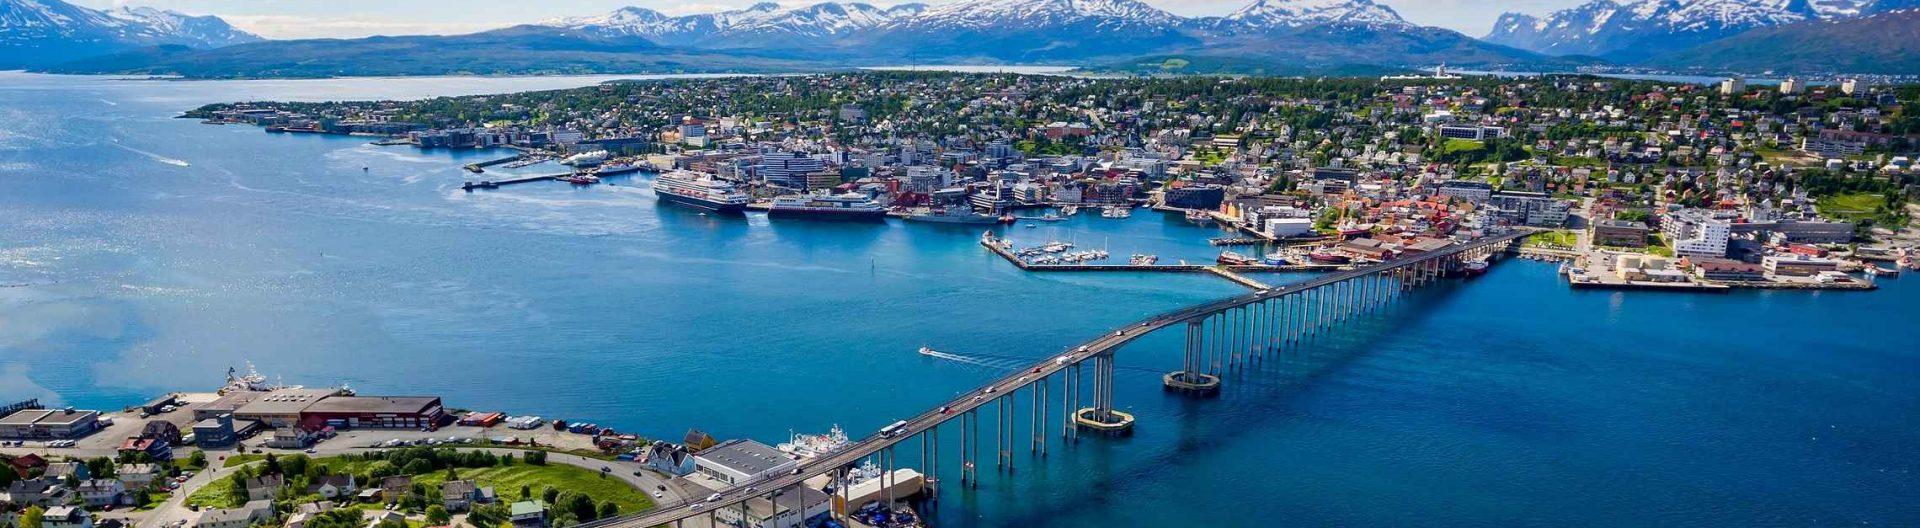 Tromso-Norja-1920x528.jpg